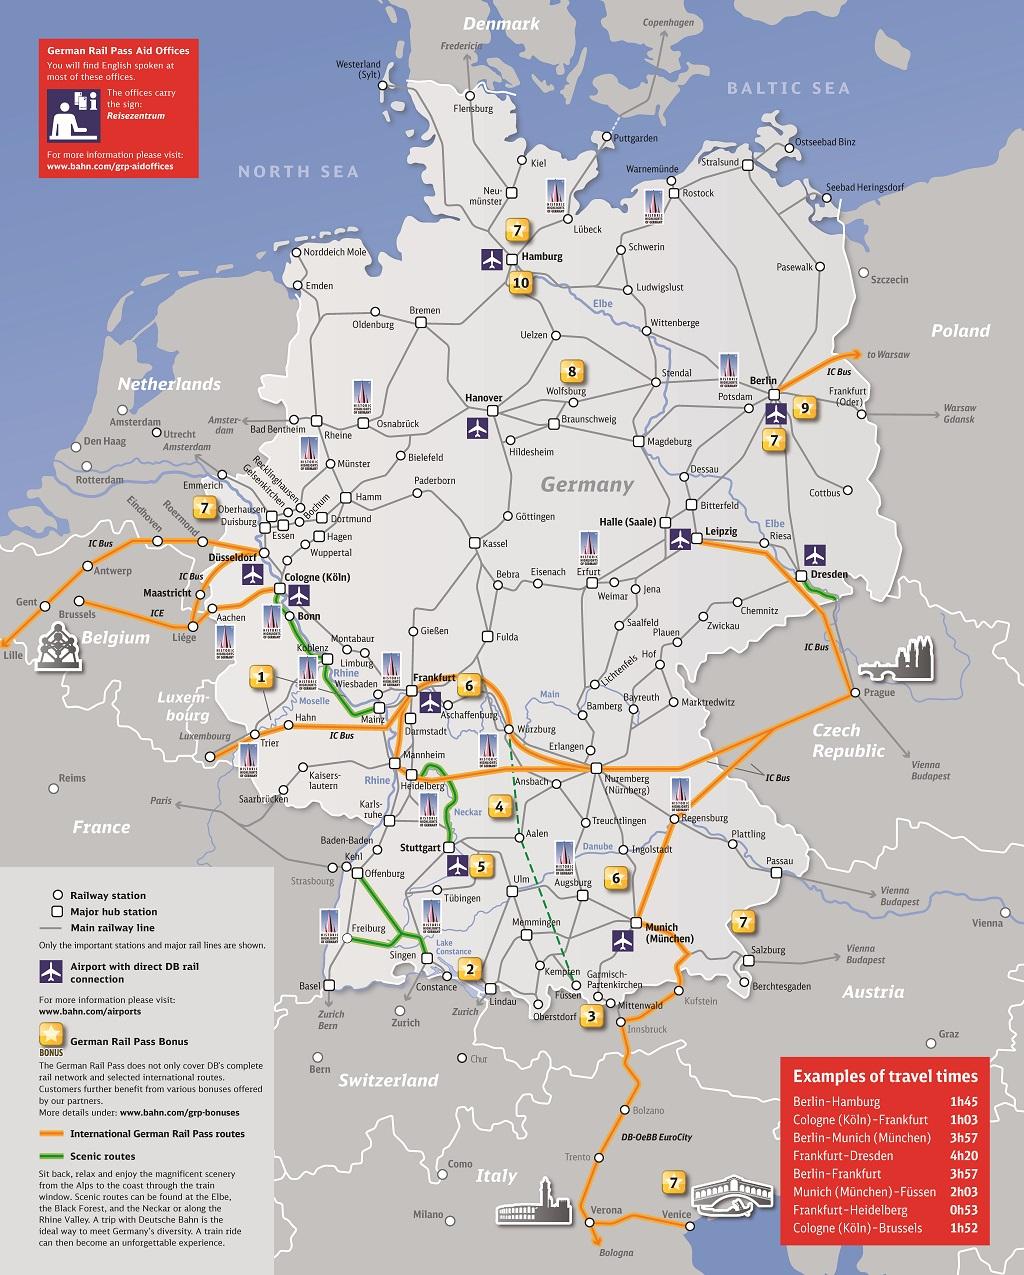 2019 German Rail Pass 優惠分佈及交通適用地圖